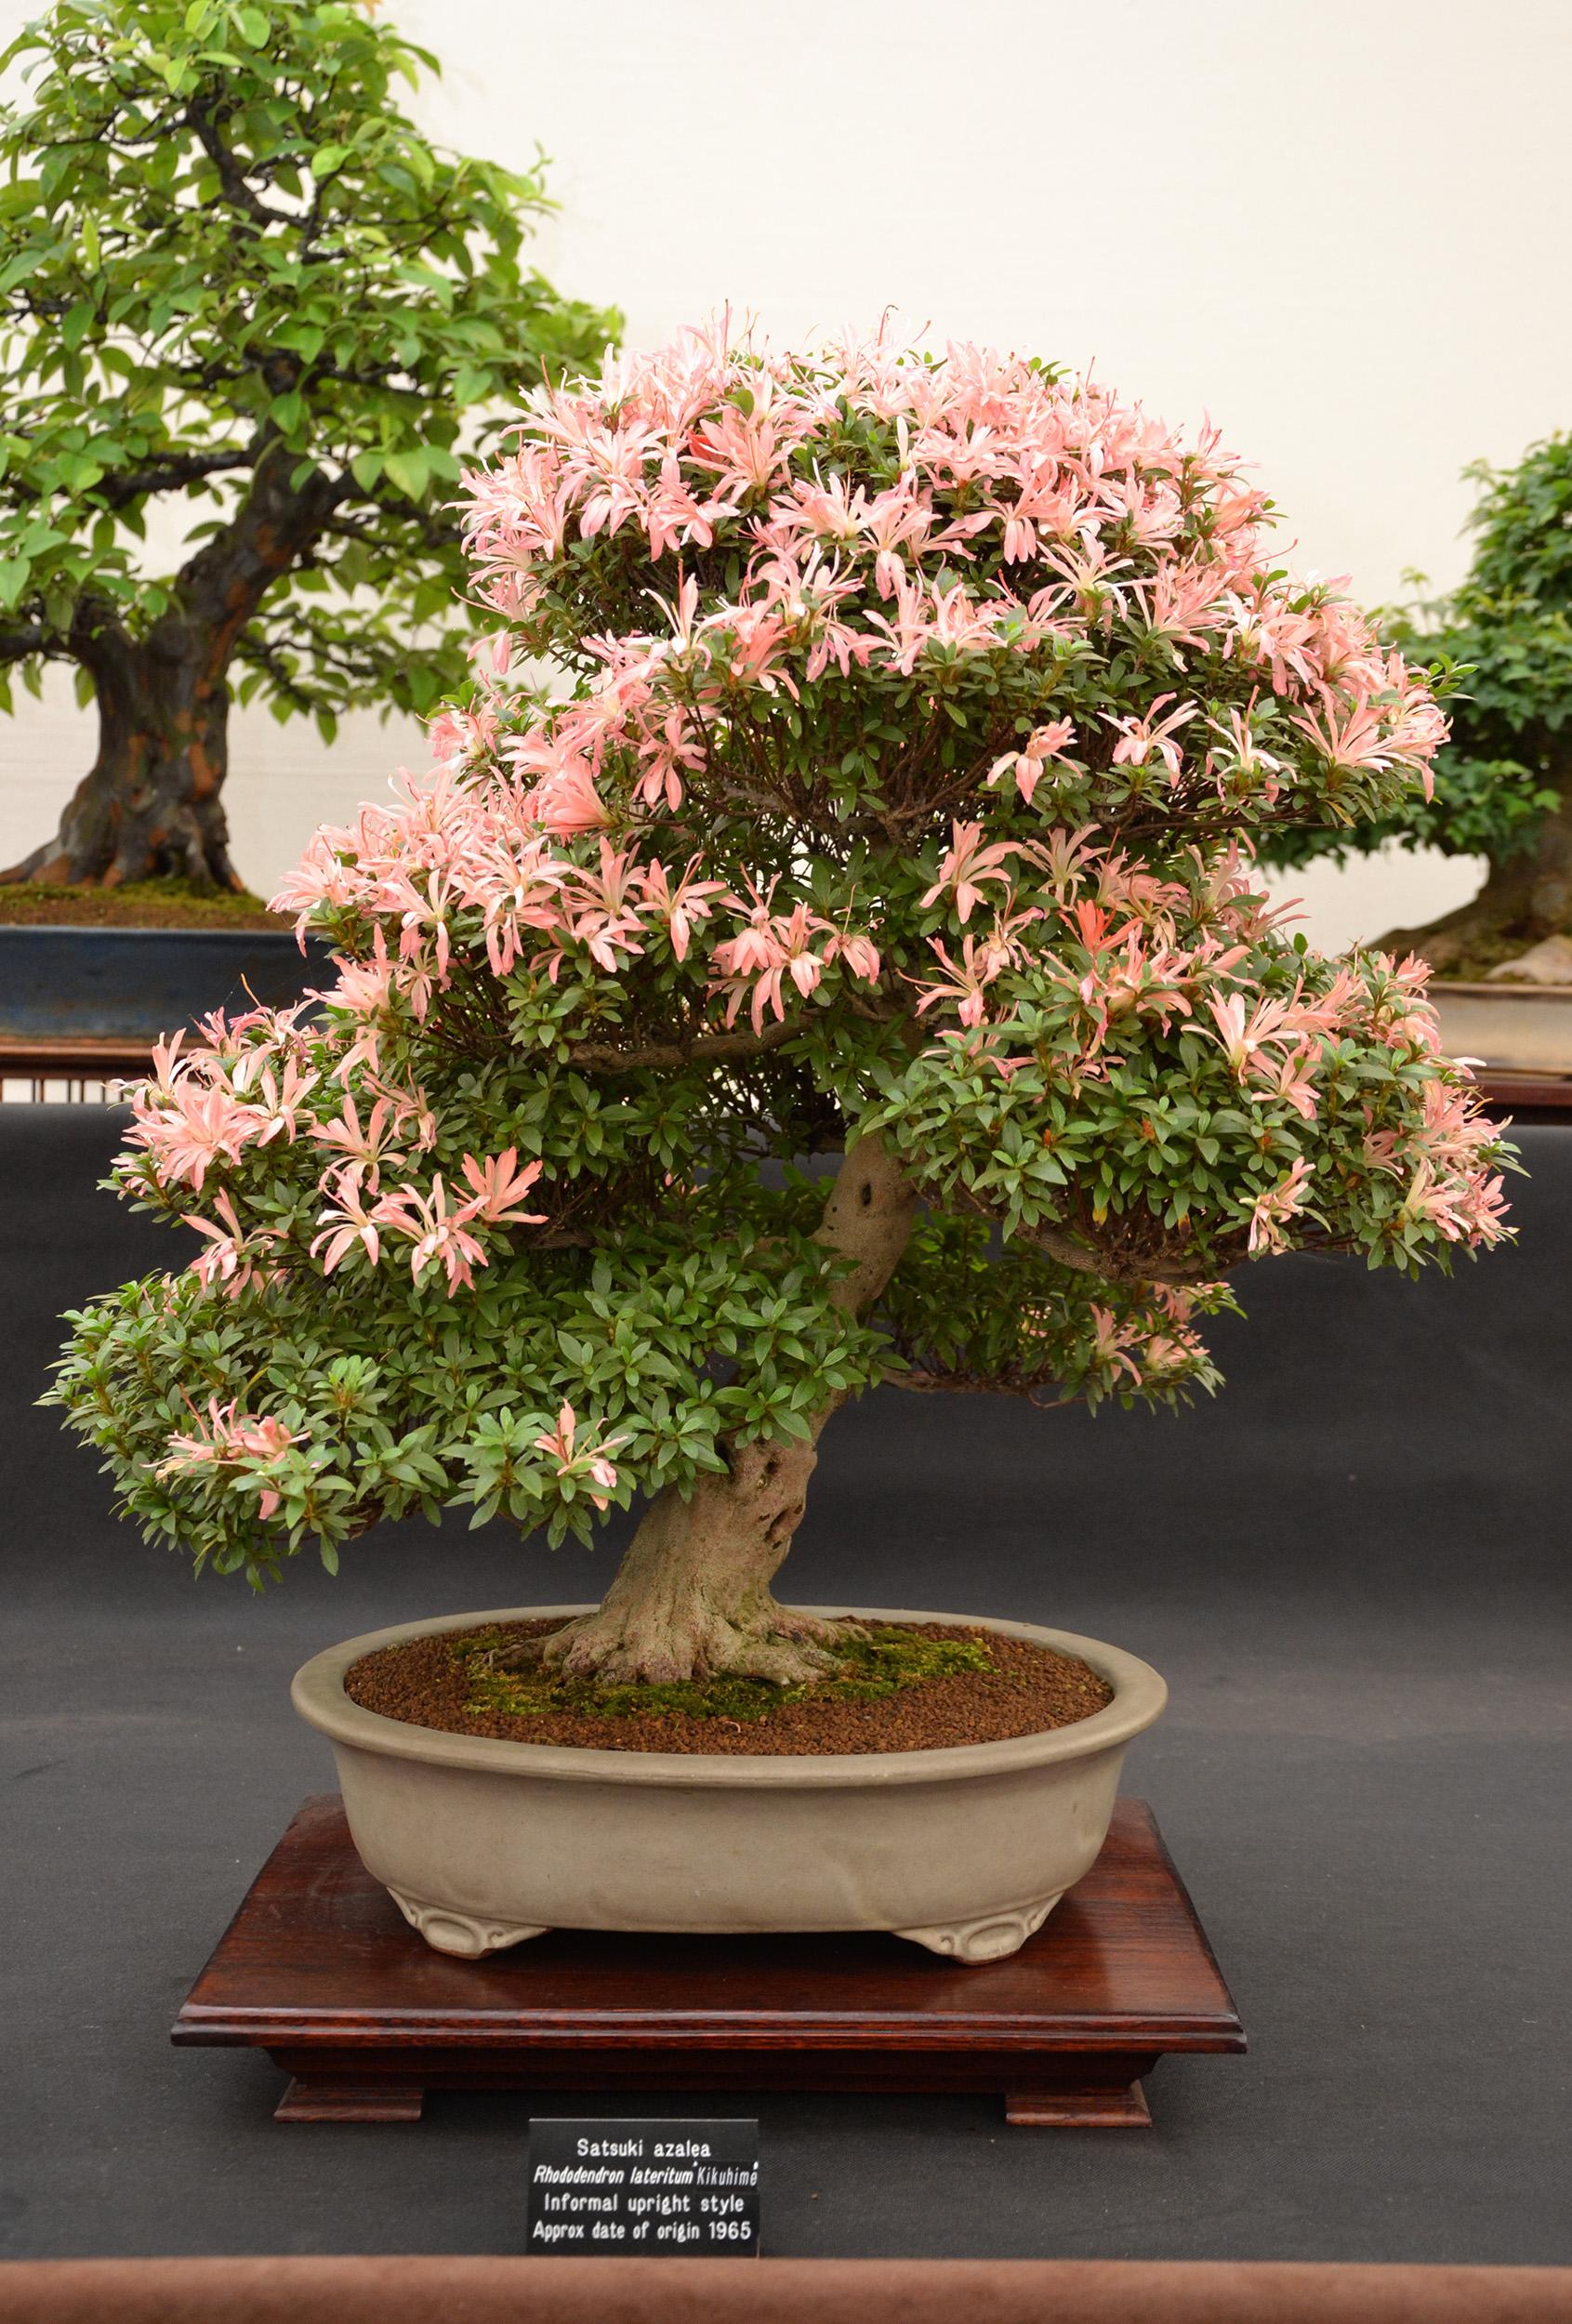 Satsuki azalea bonsai, Aesthetics, Pot, Moss, Old, HQ Photo